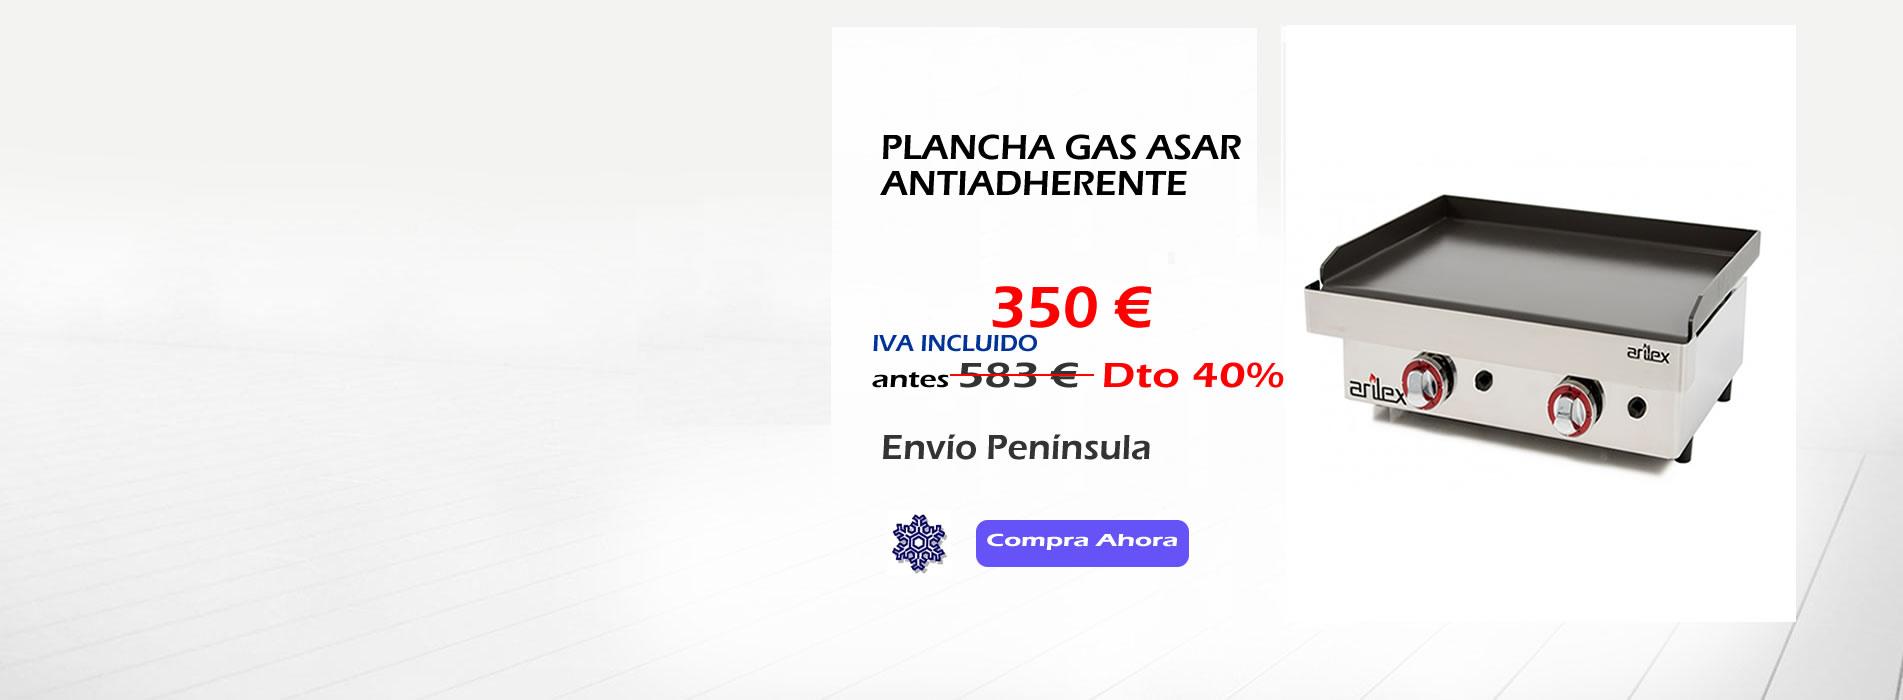 OFERTA ESPECIAL PLANCHA GAS ASAR